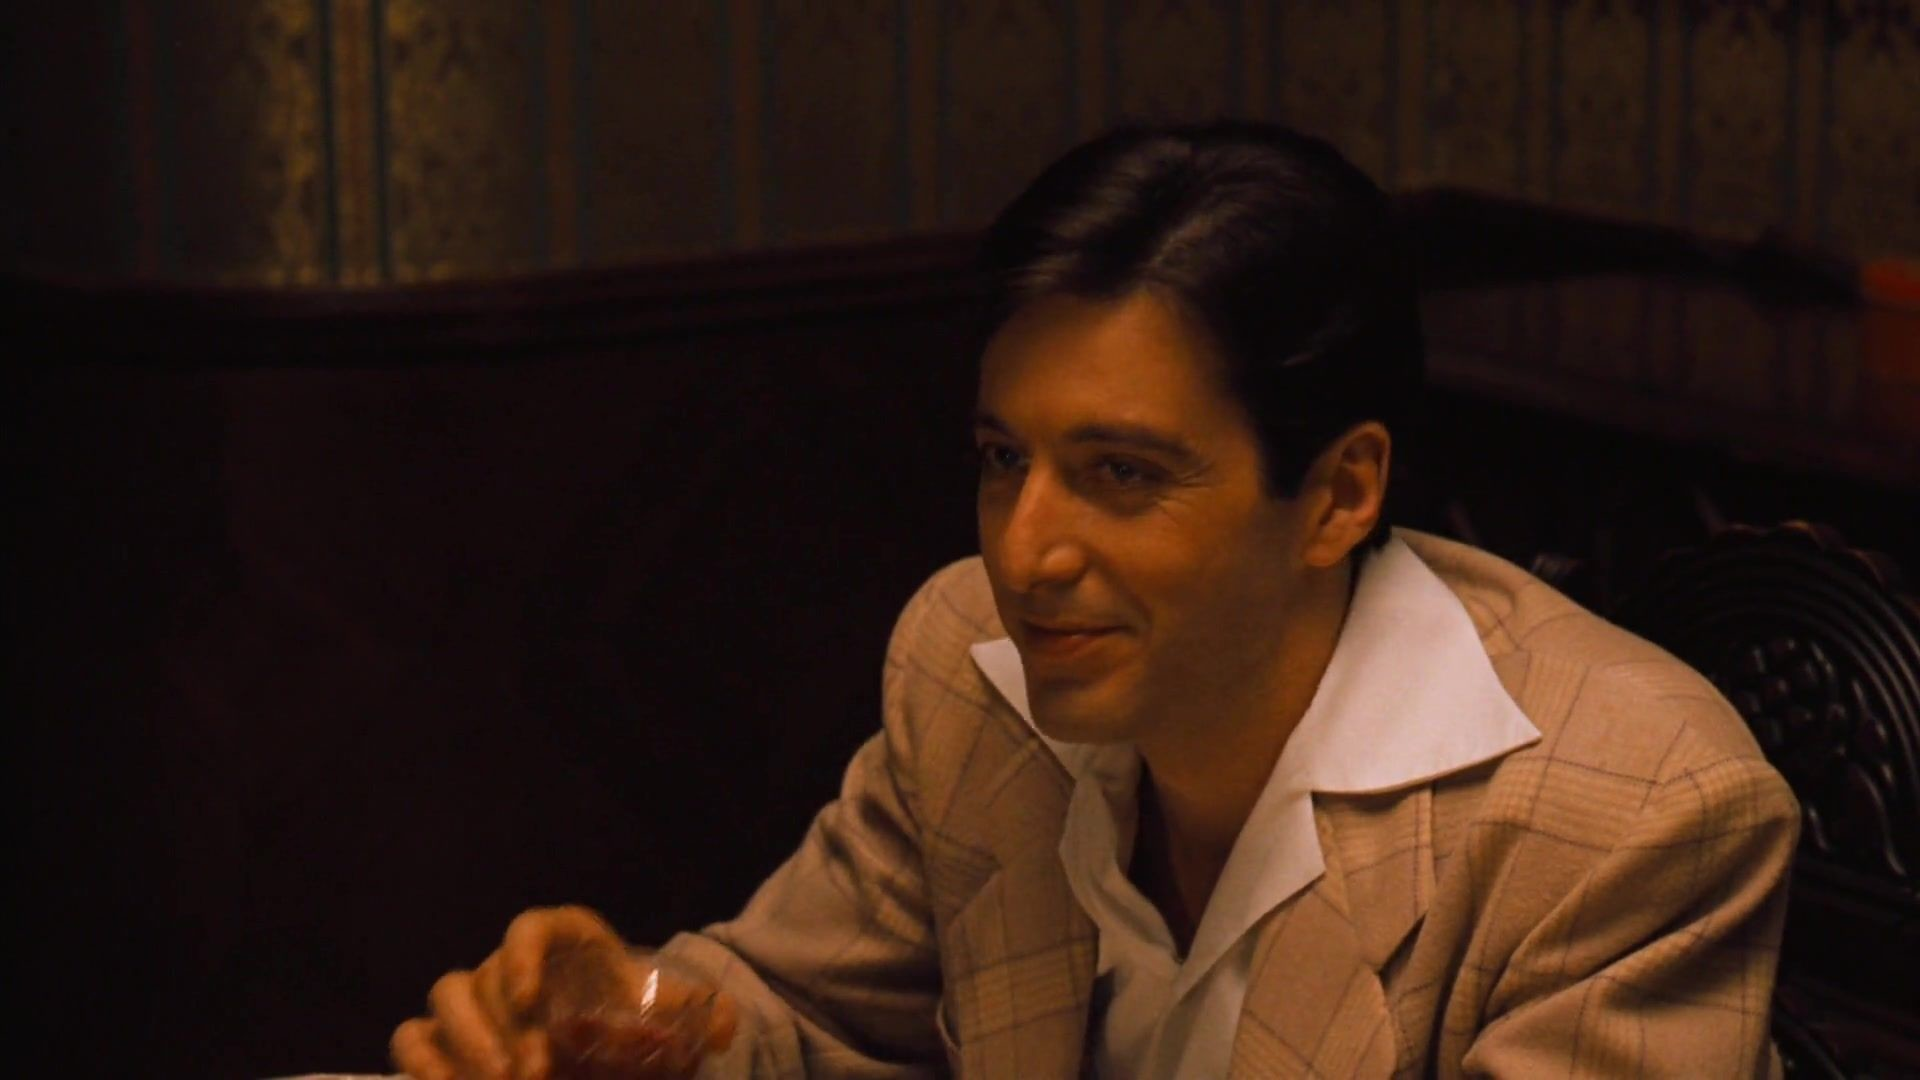 1920x1080, Wallpapers The Godfather Wallpaper   Data - Michael Corleone - HD Wallpaper